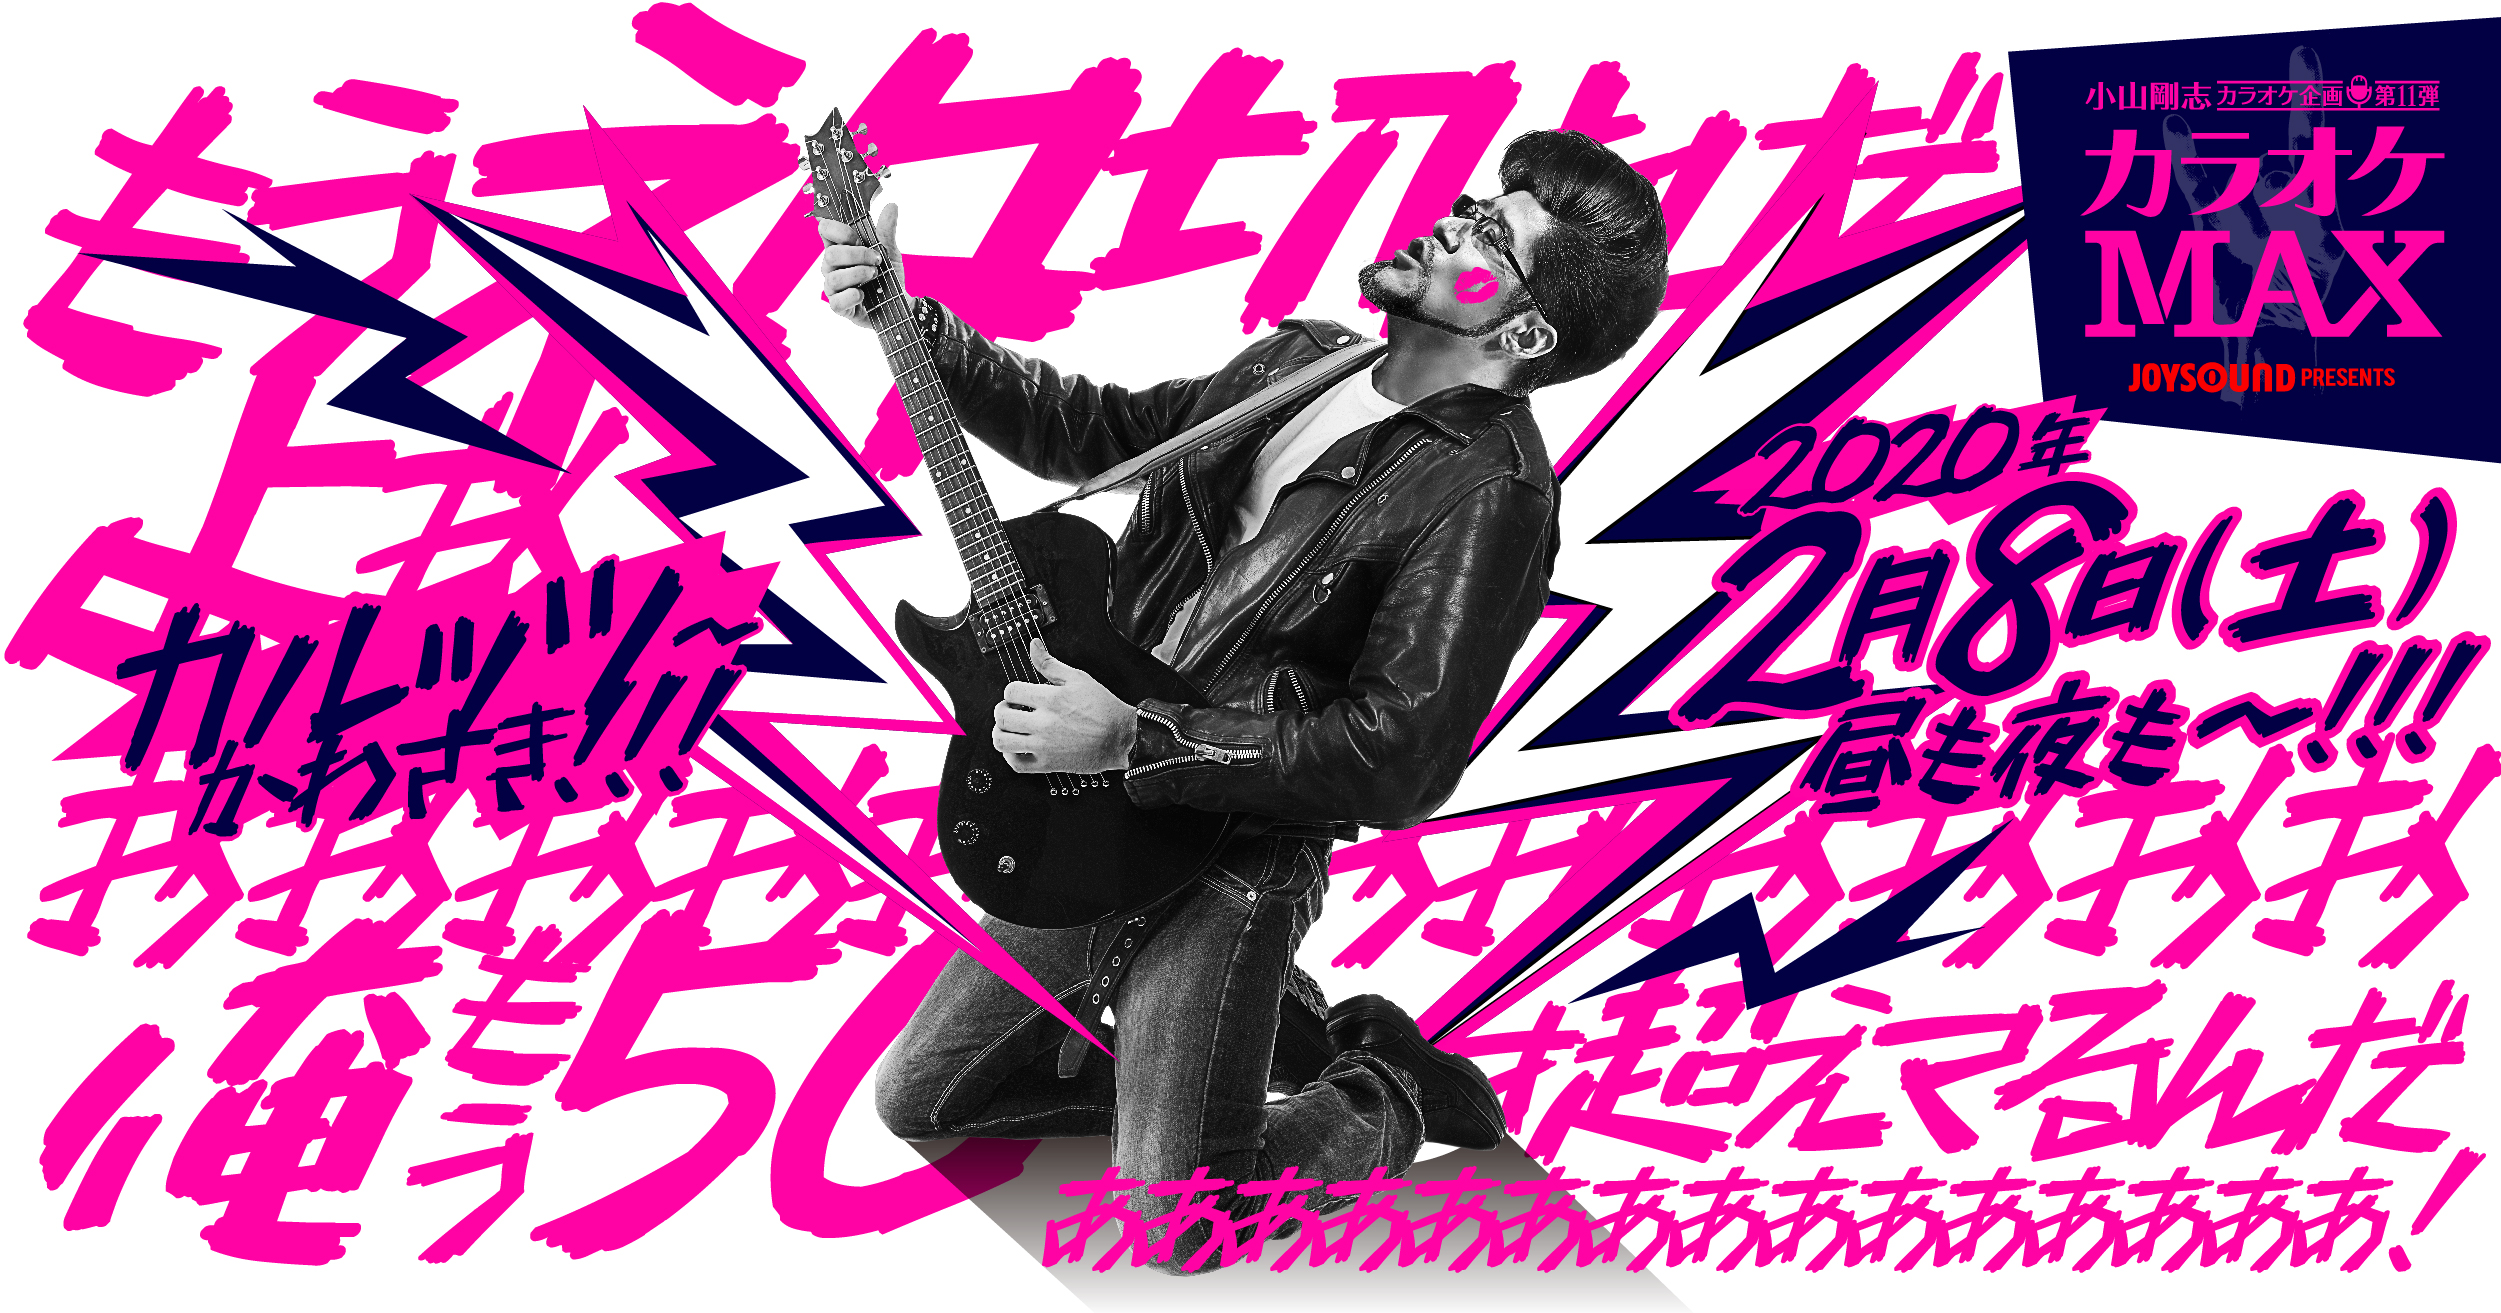 JOYSOUND presents 小山剛志カラオケ企画第11弾『カラオケMAX』